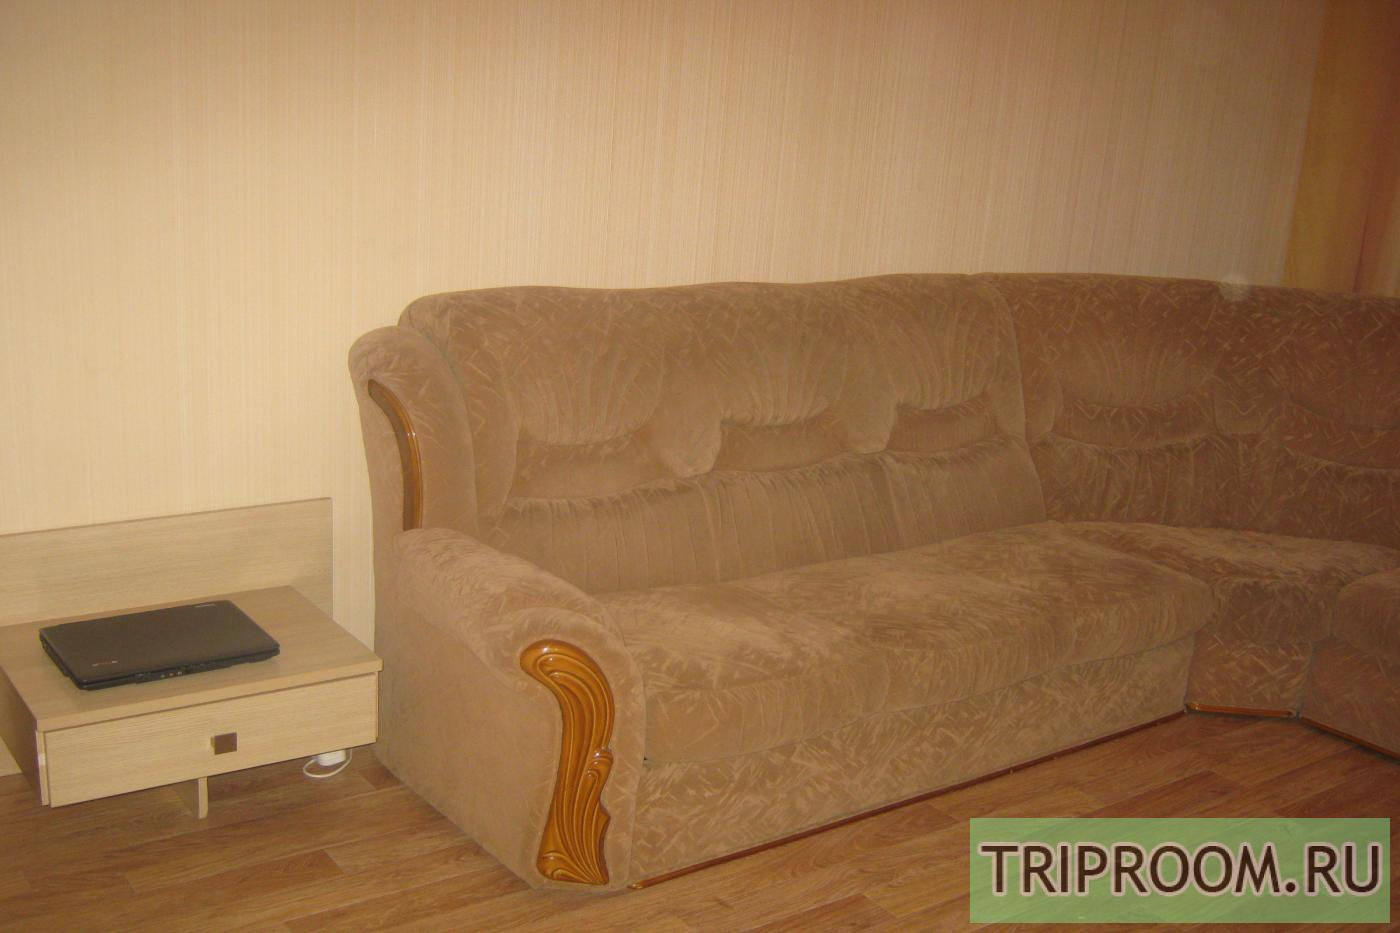 2-комнатная квартира посуточно (вариант № 5897), ул. Алексеева улица, фото № 4